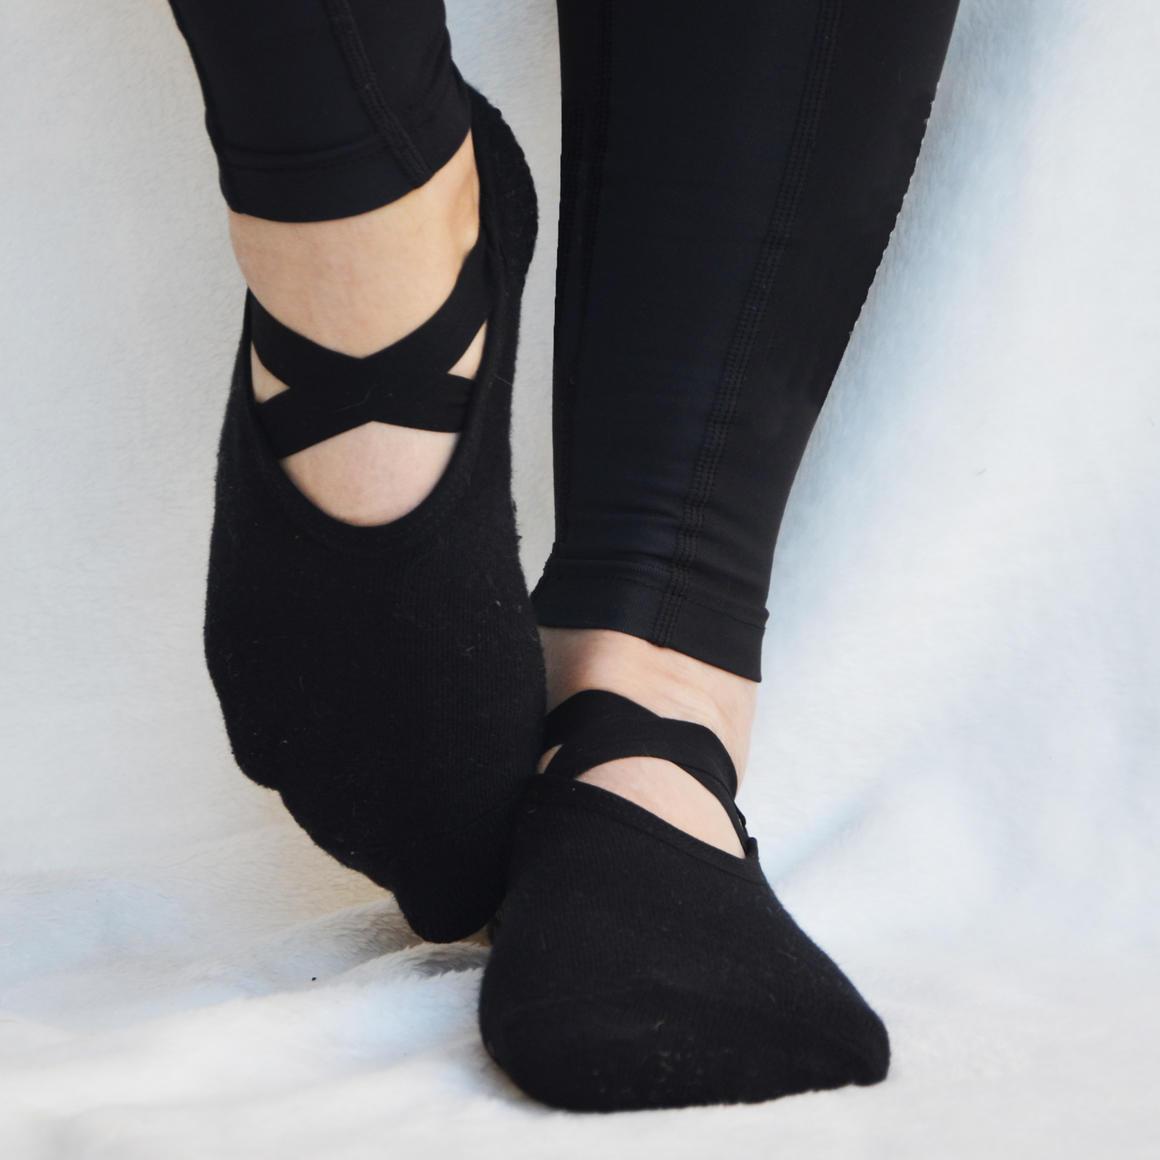 Black Ballet Non-Slip Grip Socks | Trada Marketplace